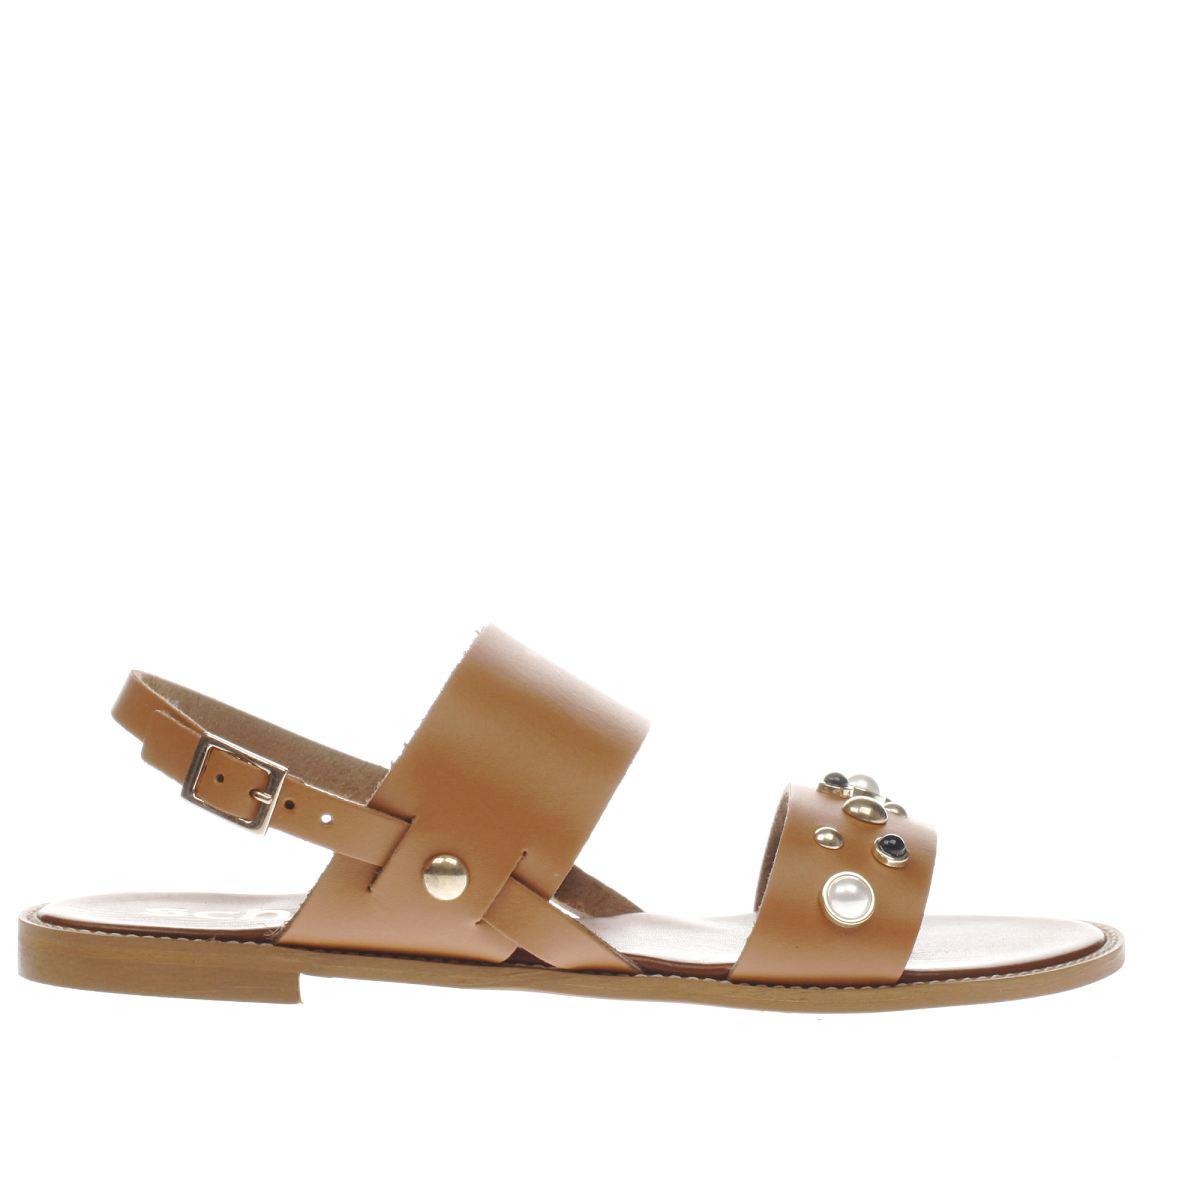 schuh tan molecule sandals